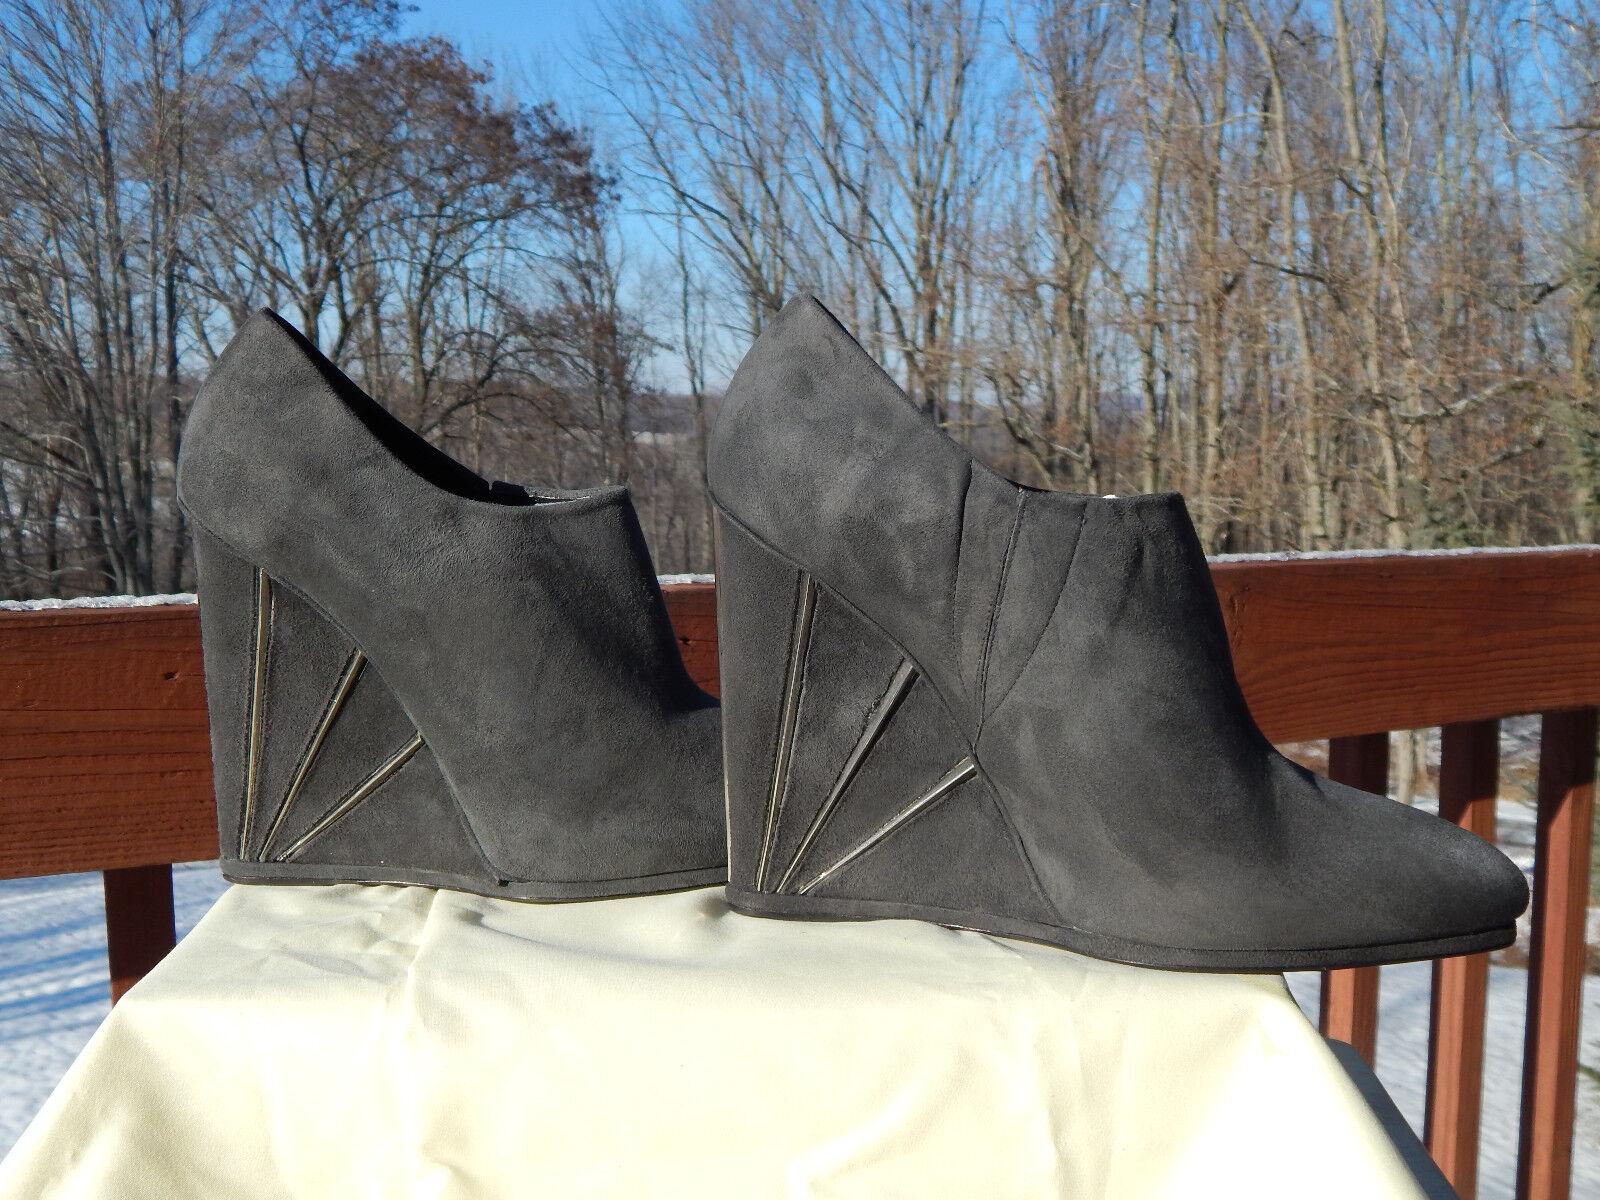 NWB Donna Stuart Weitzman Crop Wedge Booties, 9M Slate Suede style MQ32066